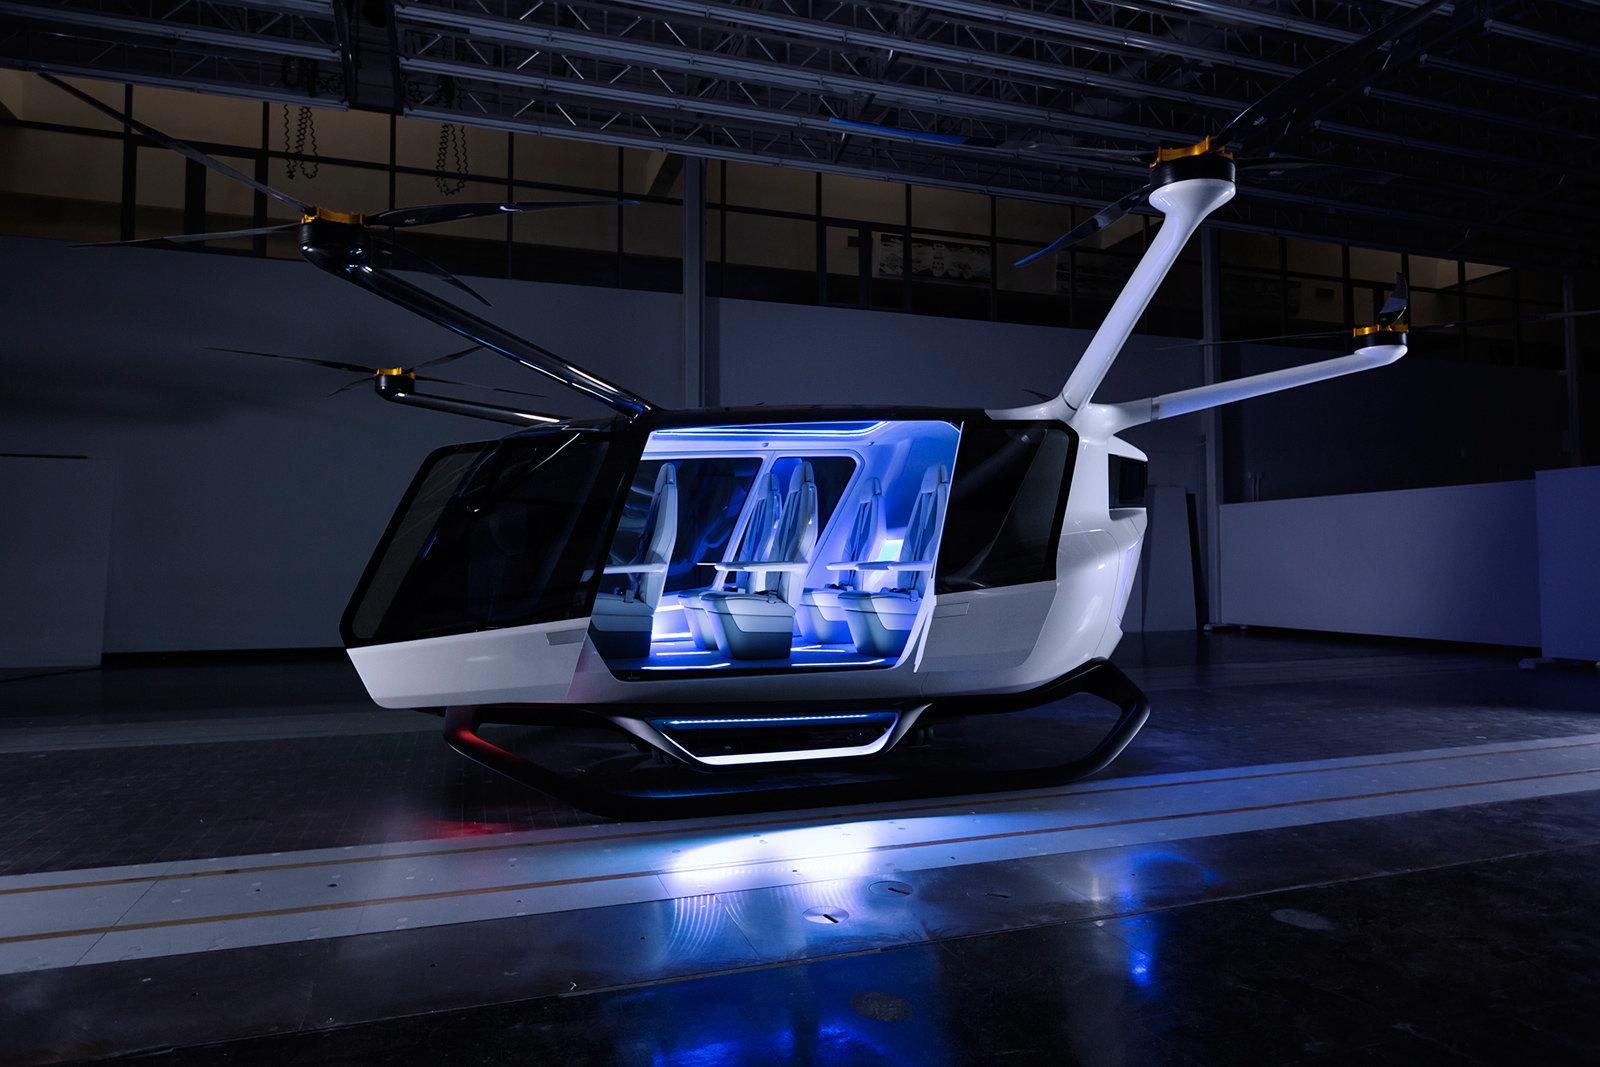 alakai-flying-taxi-hydrogen-cells